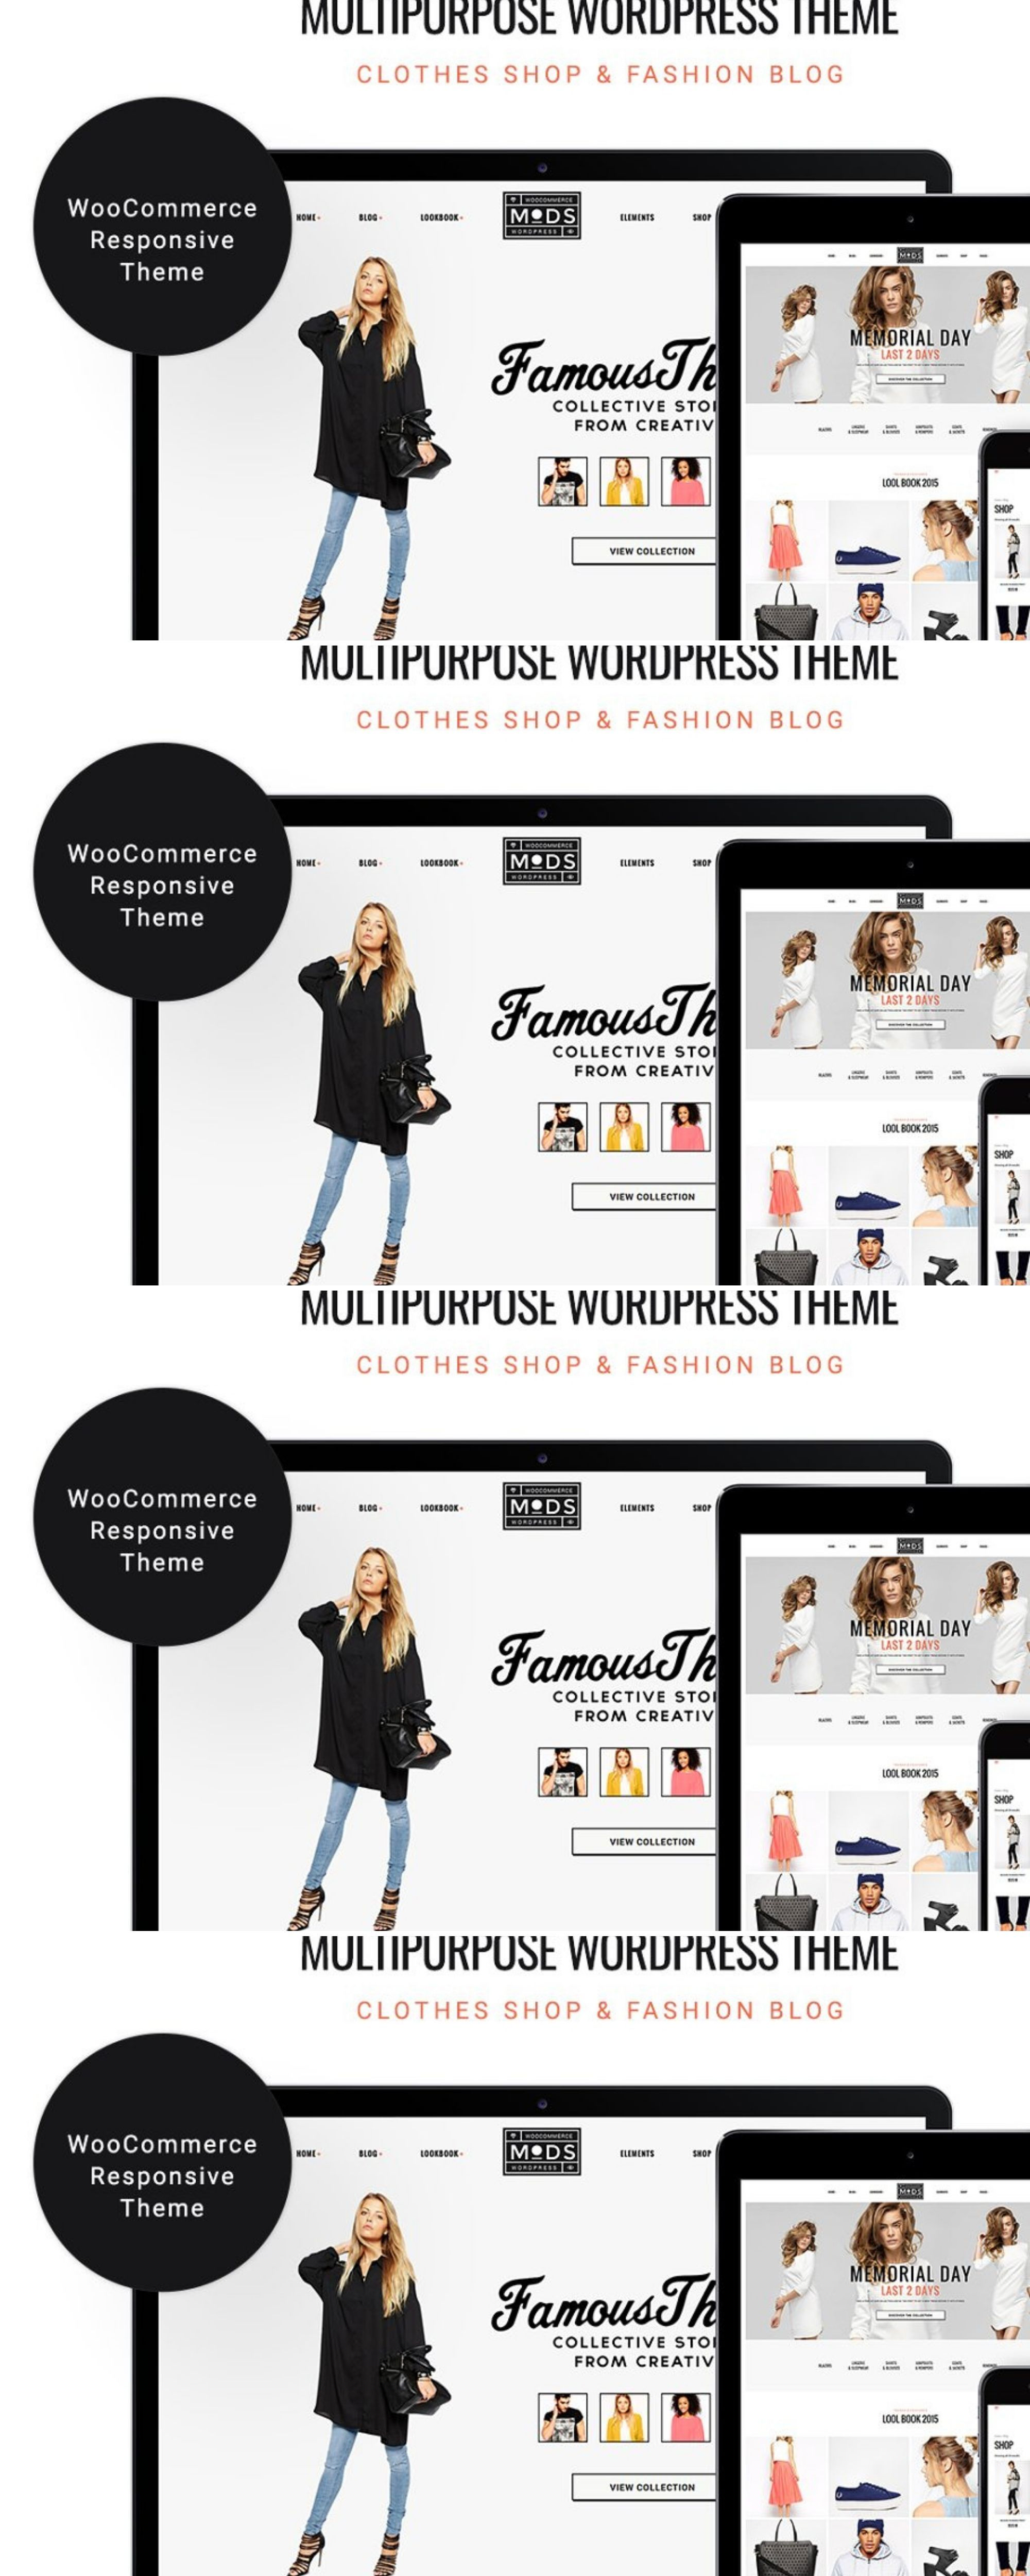 MODS - Shop & Fashion Blog WP Theme | UI Inspiration: Pink